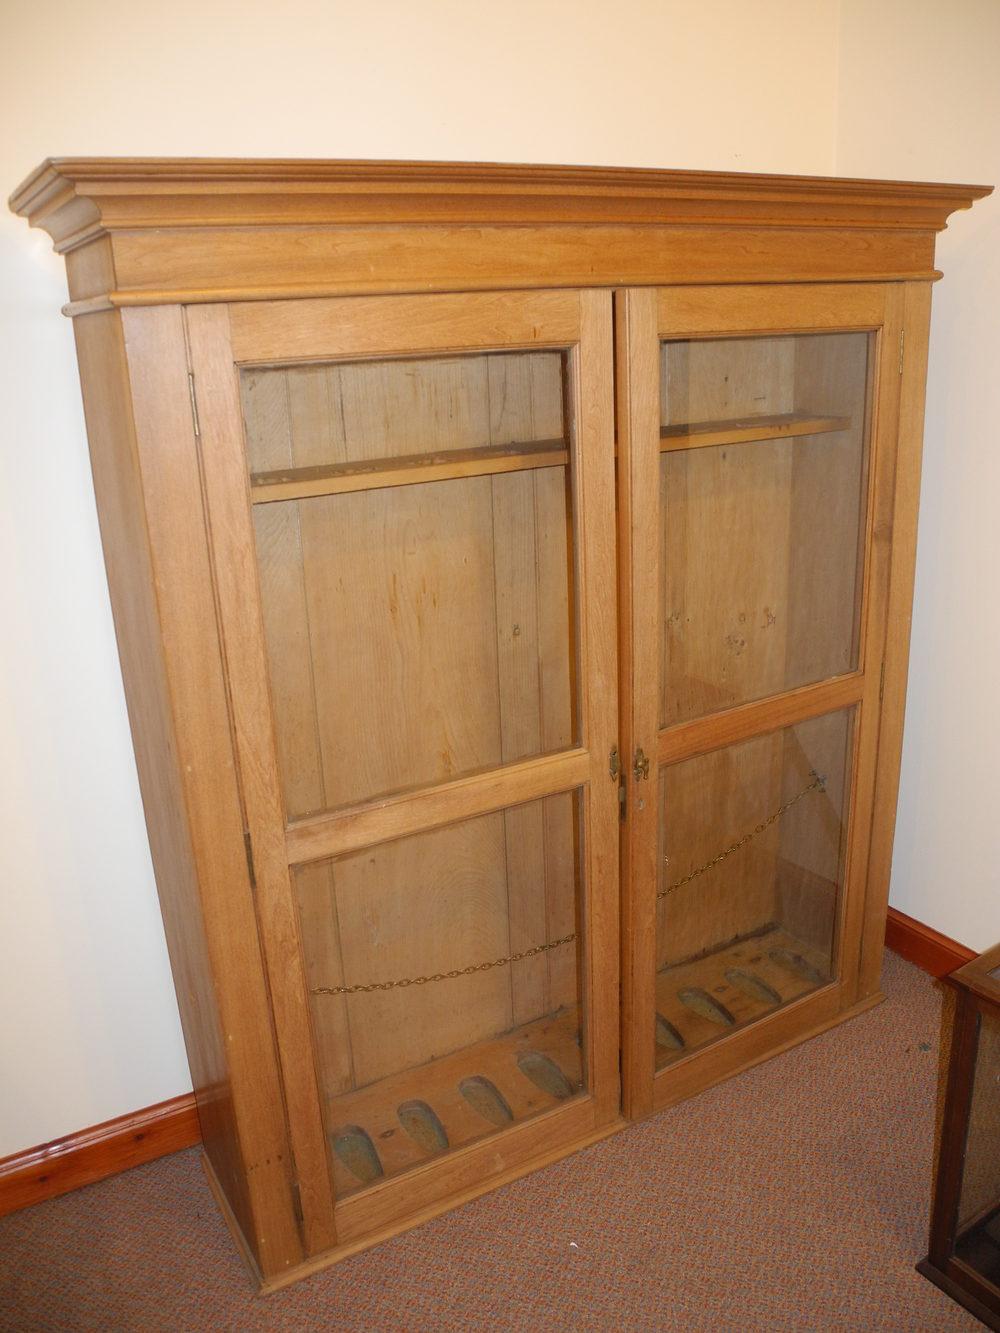 Peachy Large Pine Gun Cabinet Download Free Architecture Designs Scobabritishbridgeorg